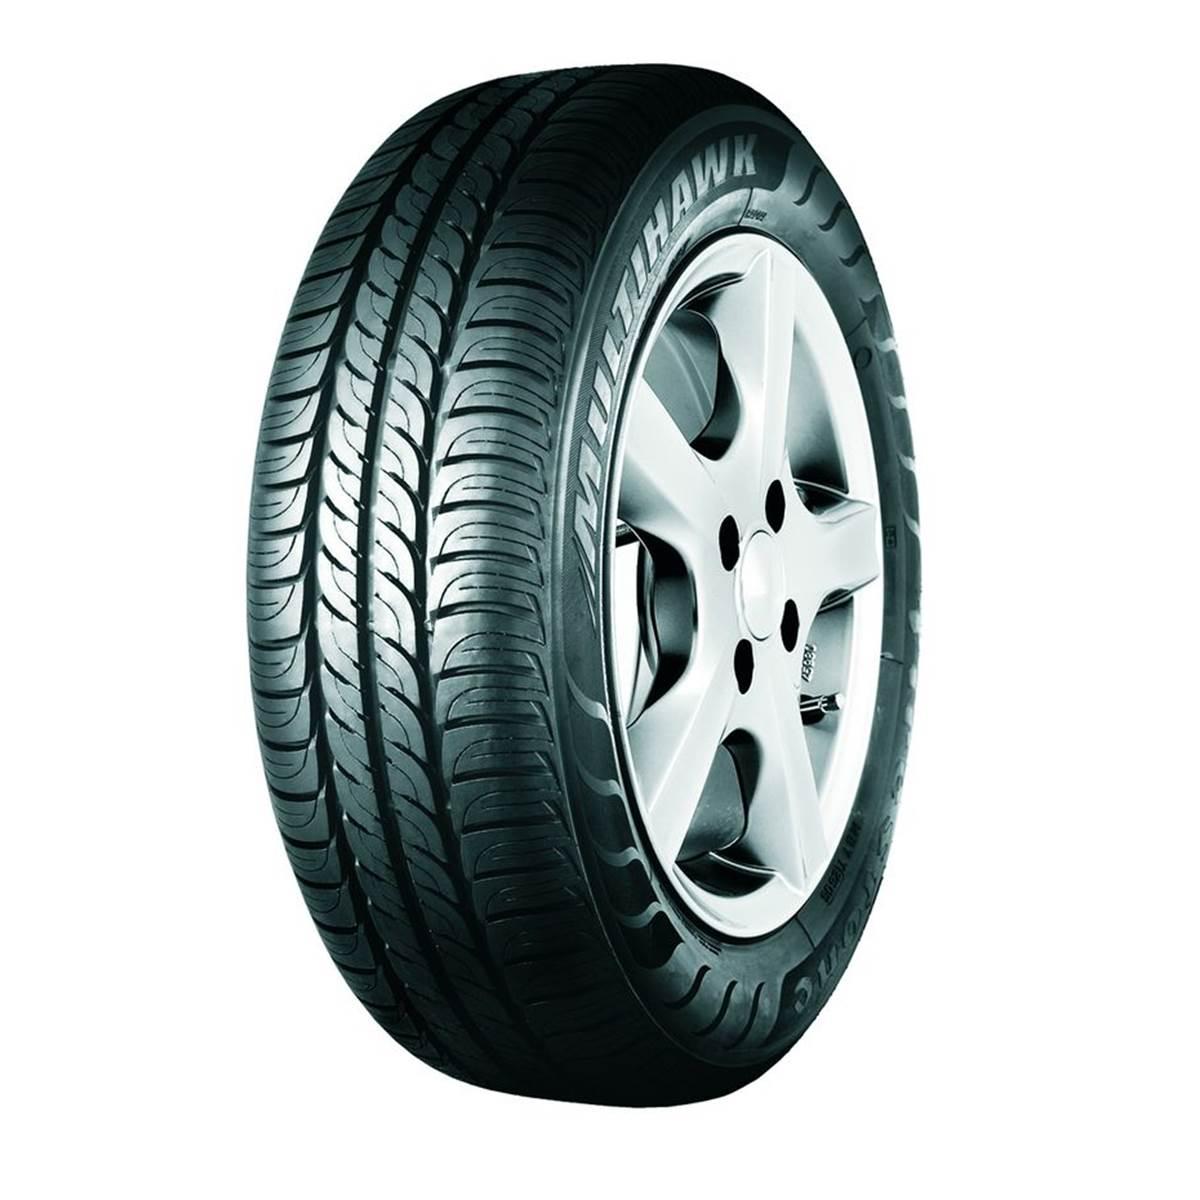 Comparer les prix des pneus Firestone Multihawk